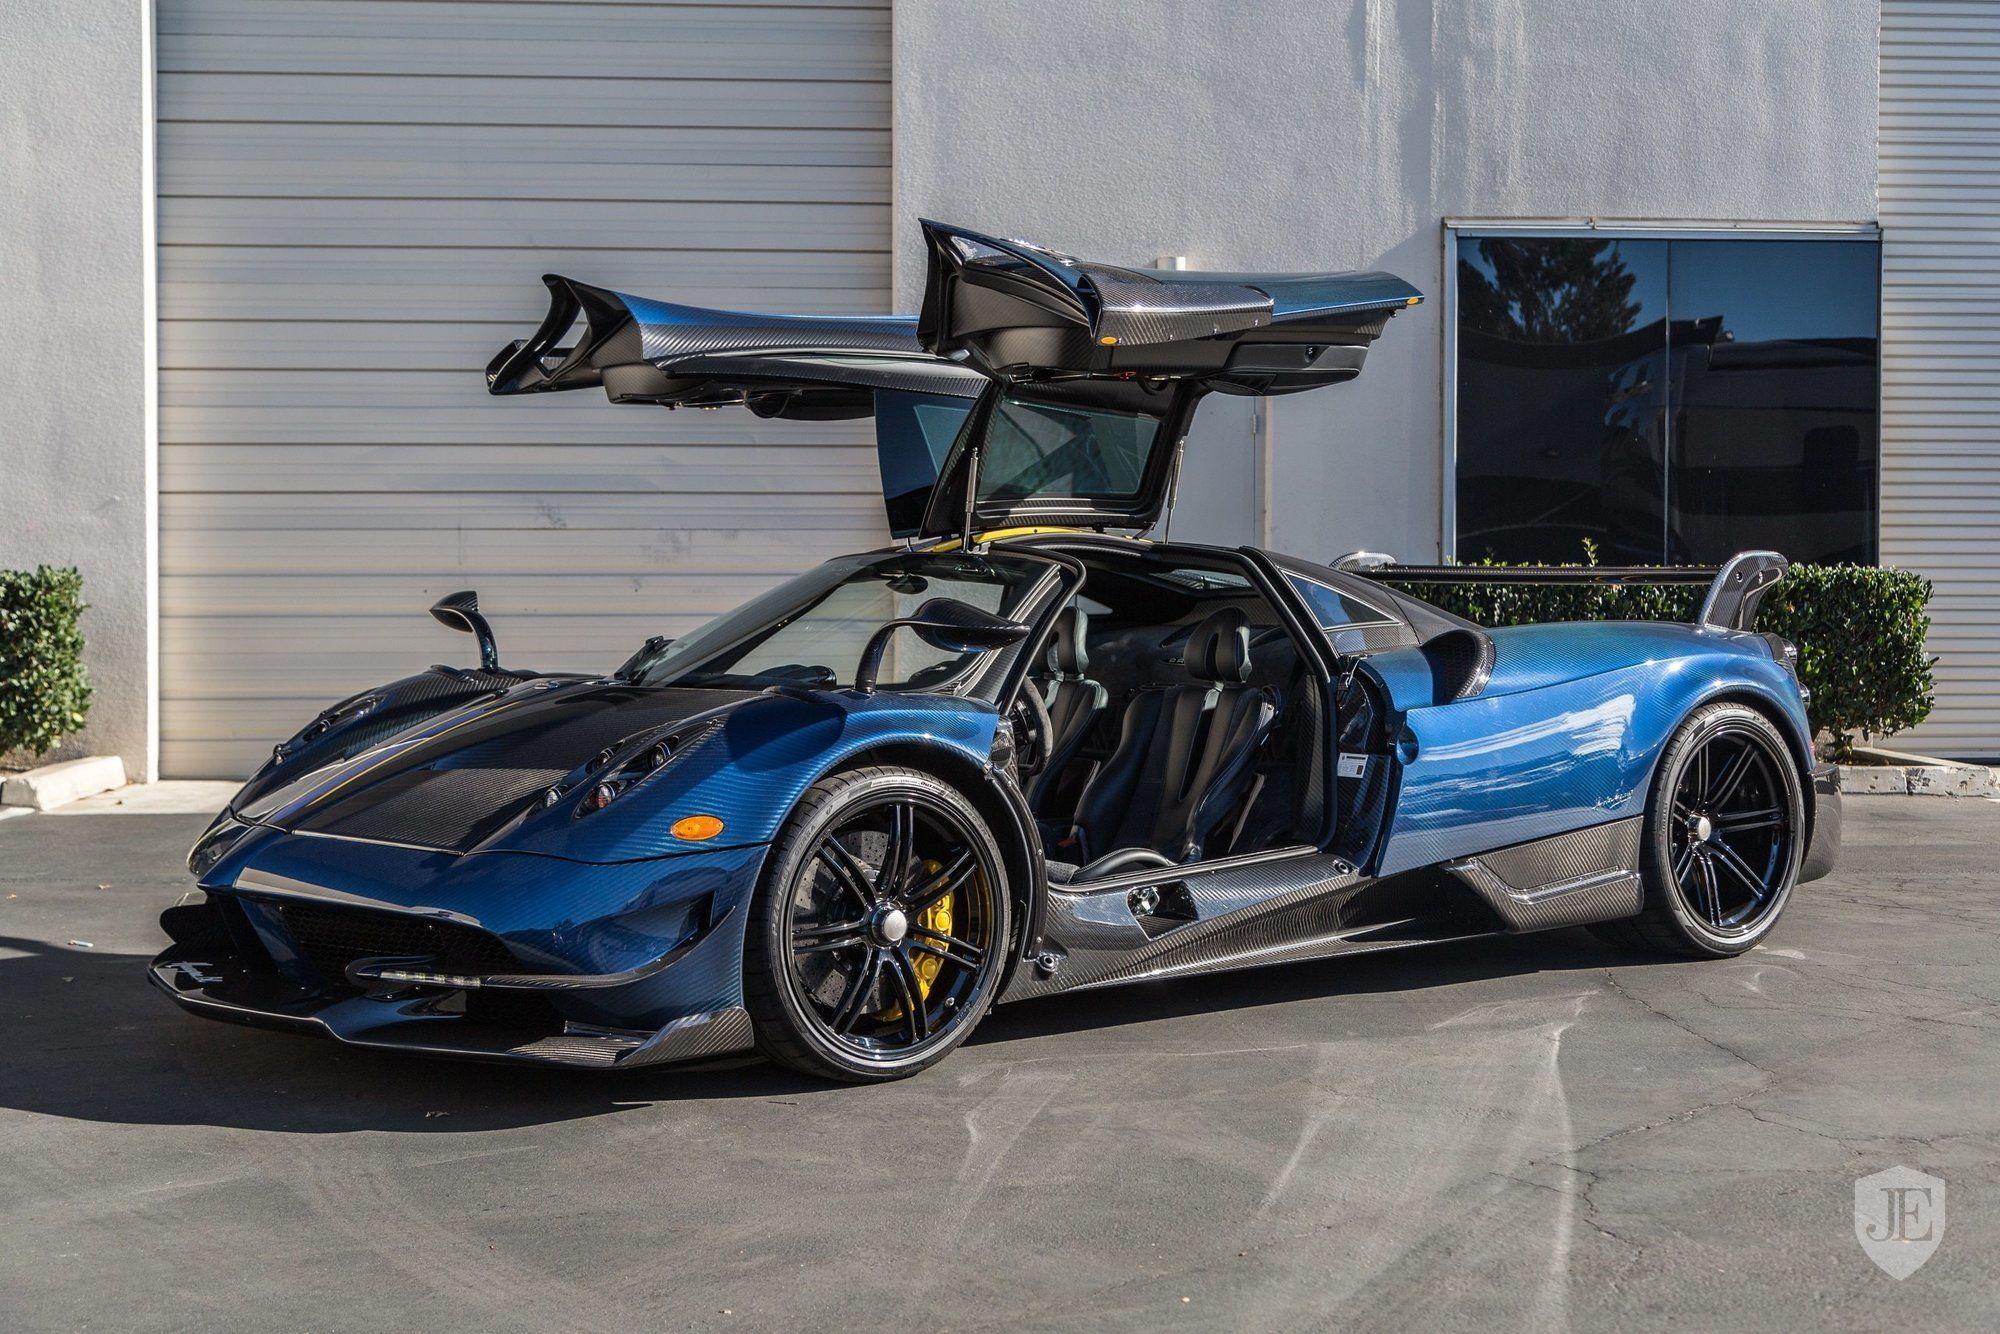 Lexus Newport Beach >> Pagani Huayra BC For Sale In Newport Beach | Supercar Report